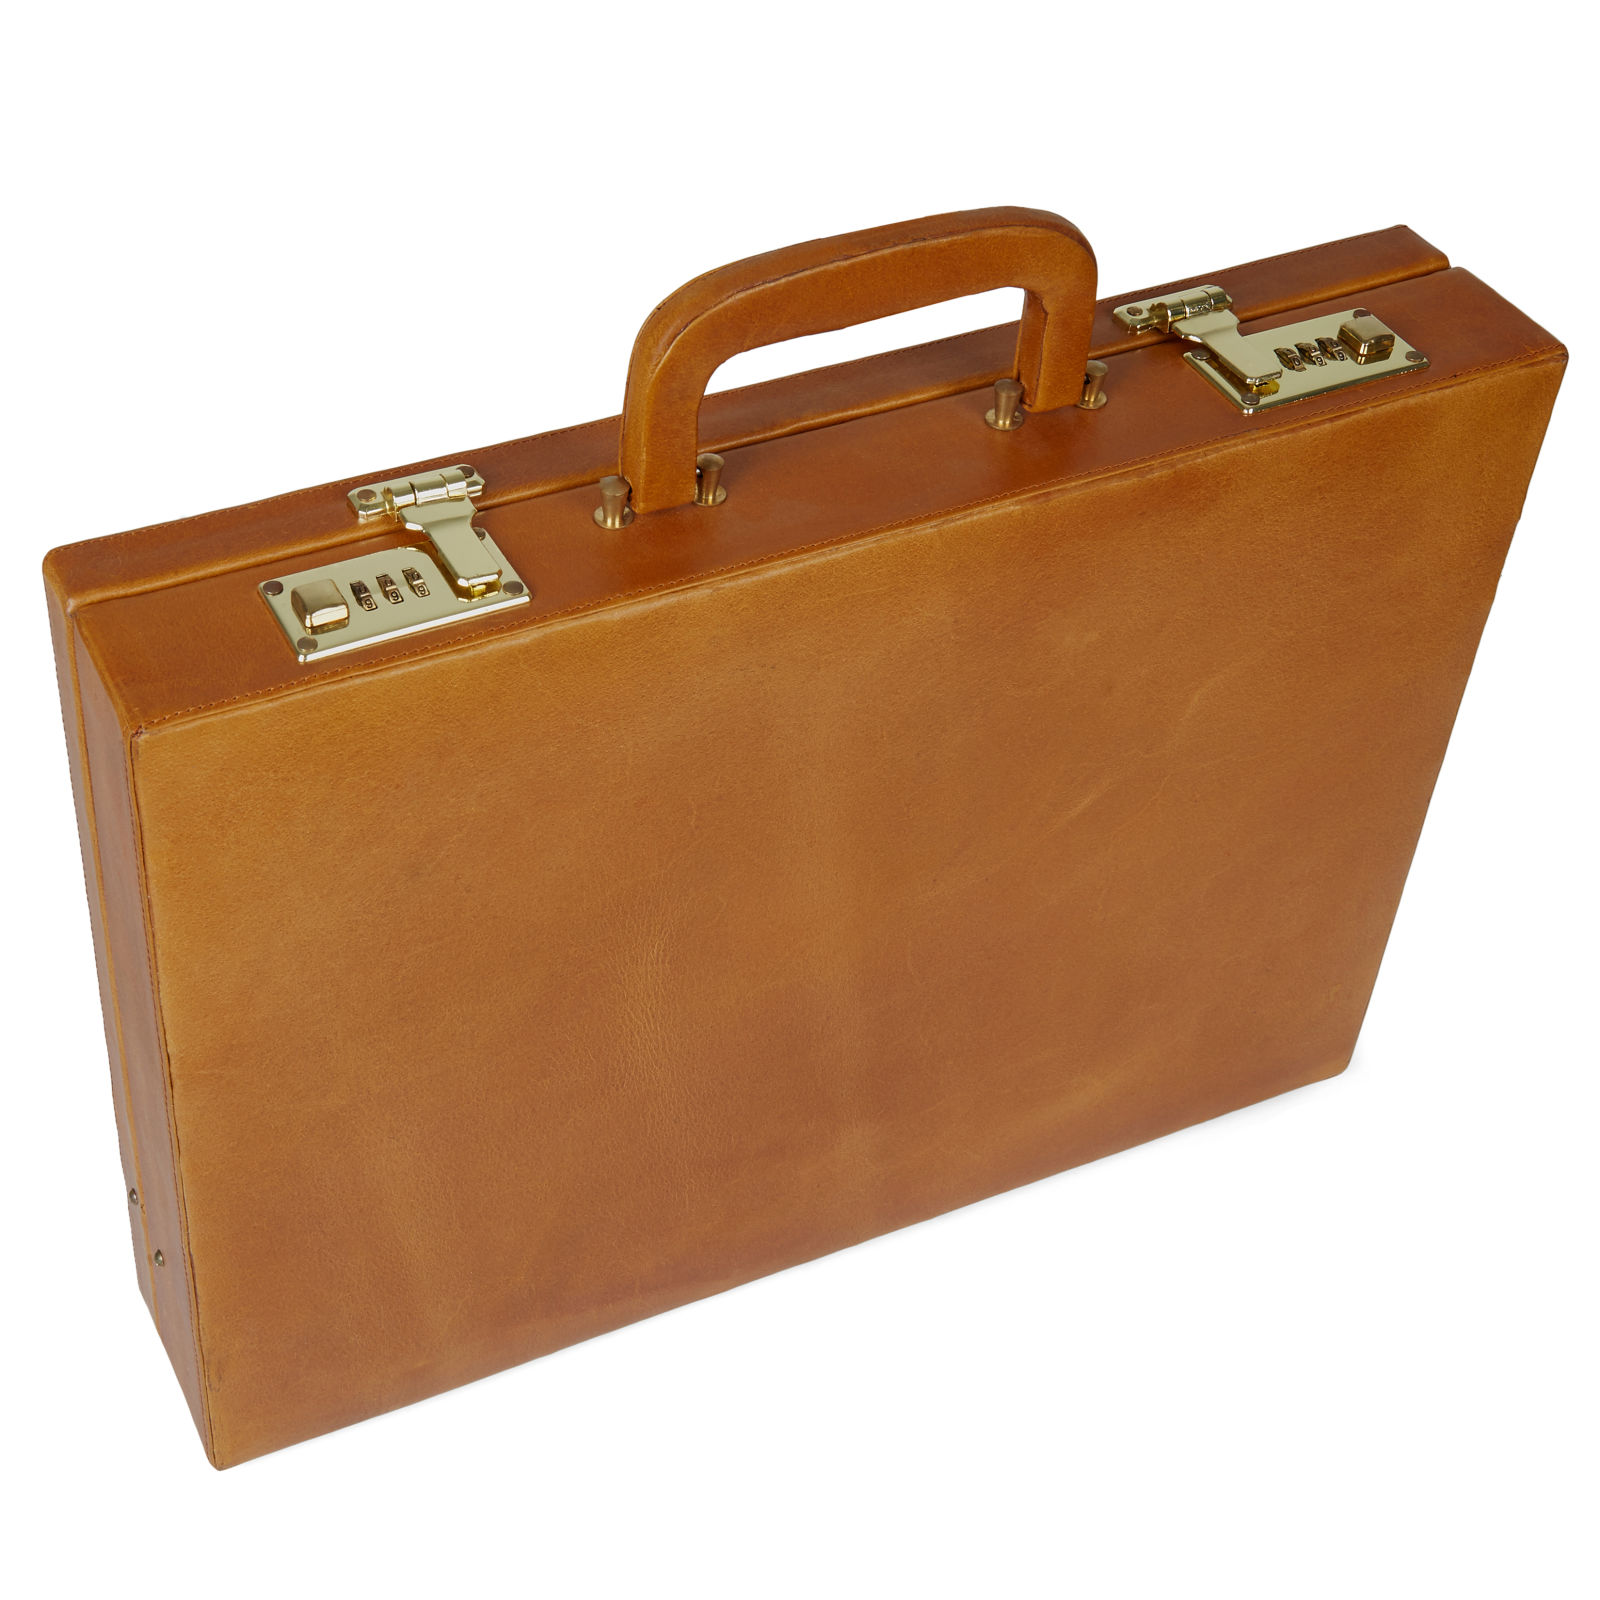 Porte-documents en cuir marron Bucko vjvoCrC